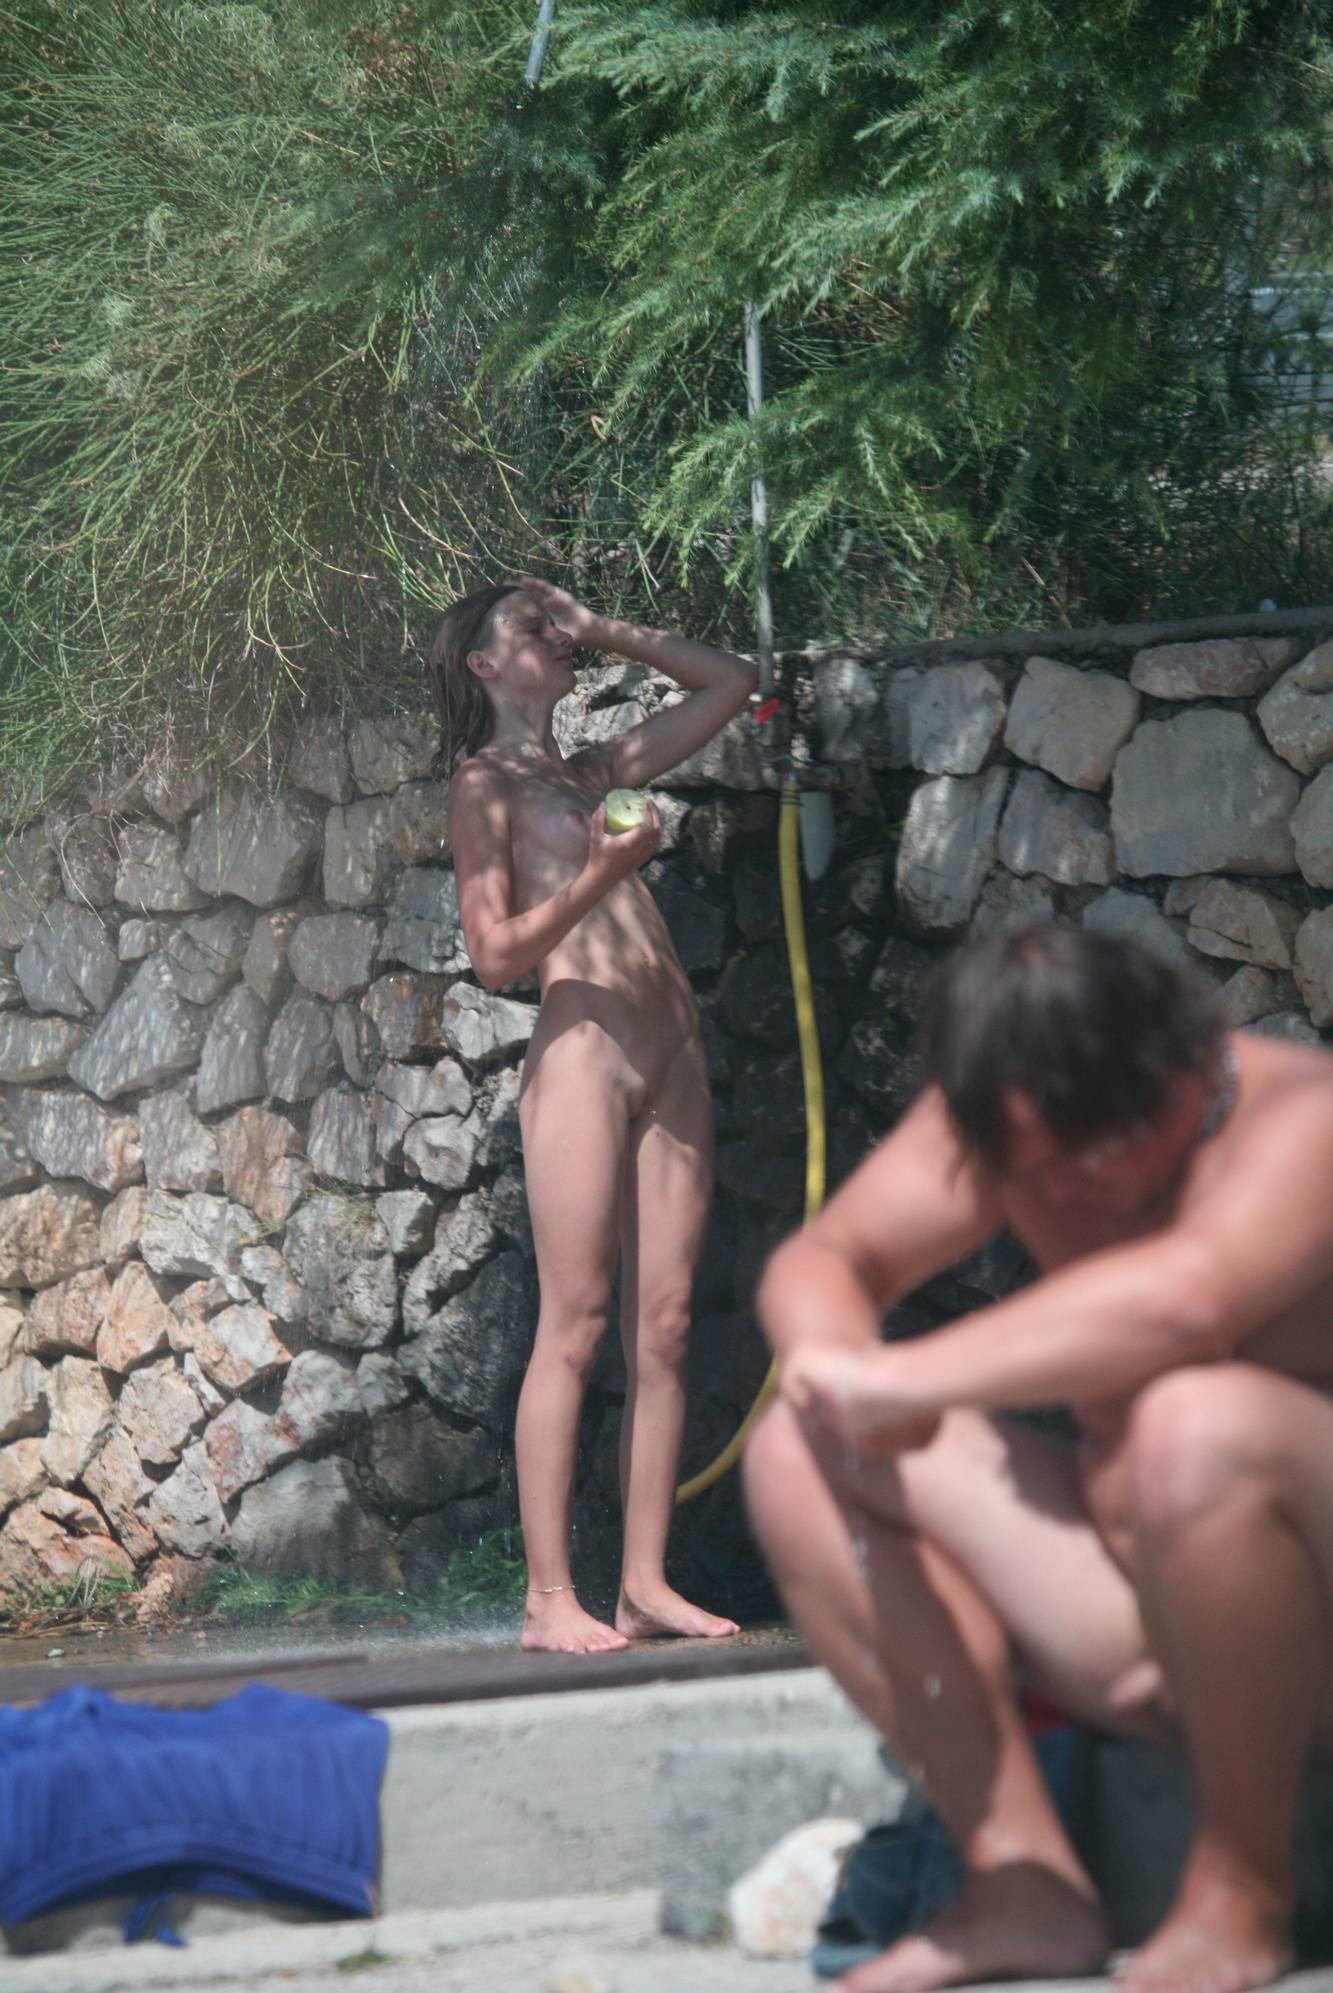 Nudist Gallery Shower-Wall FKK Sister - 1